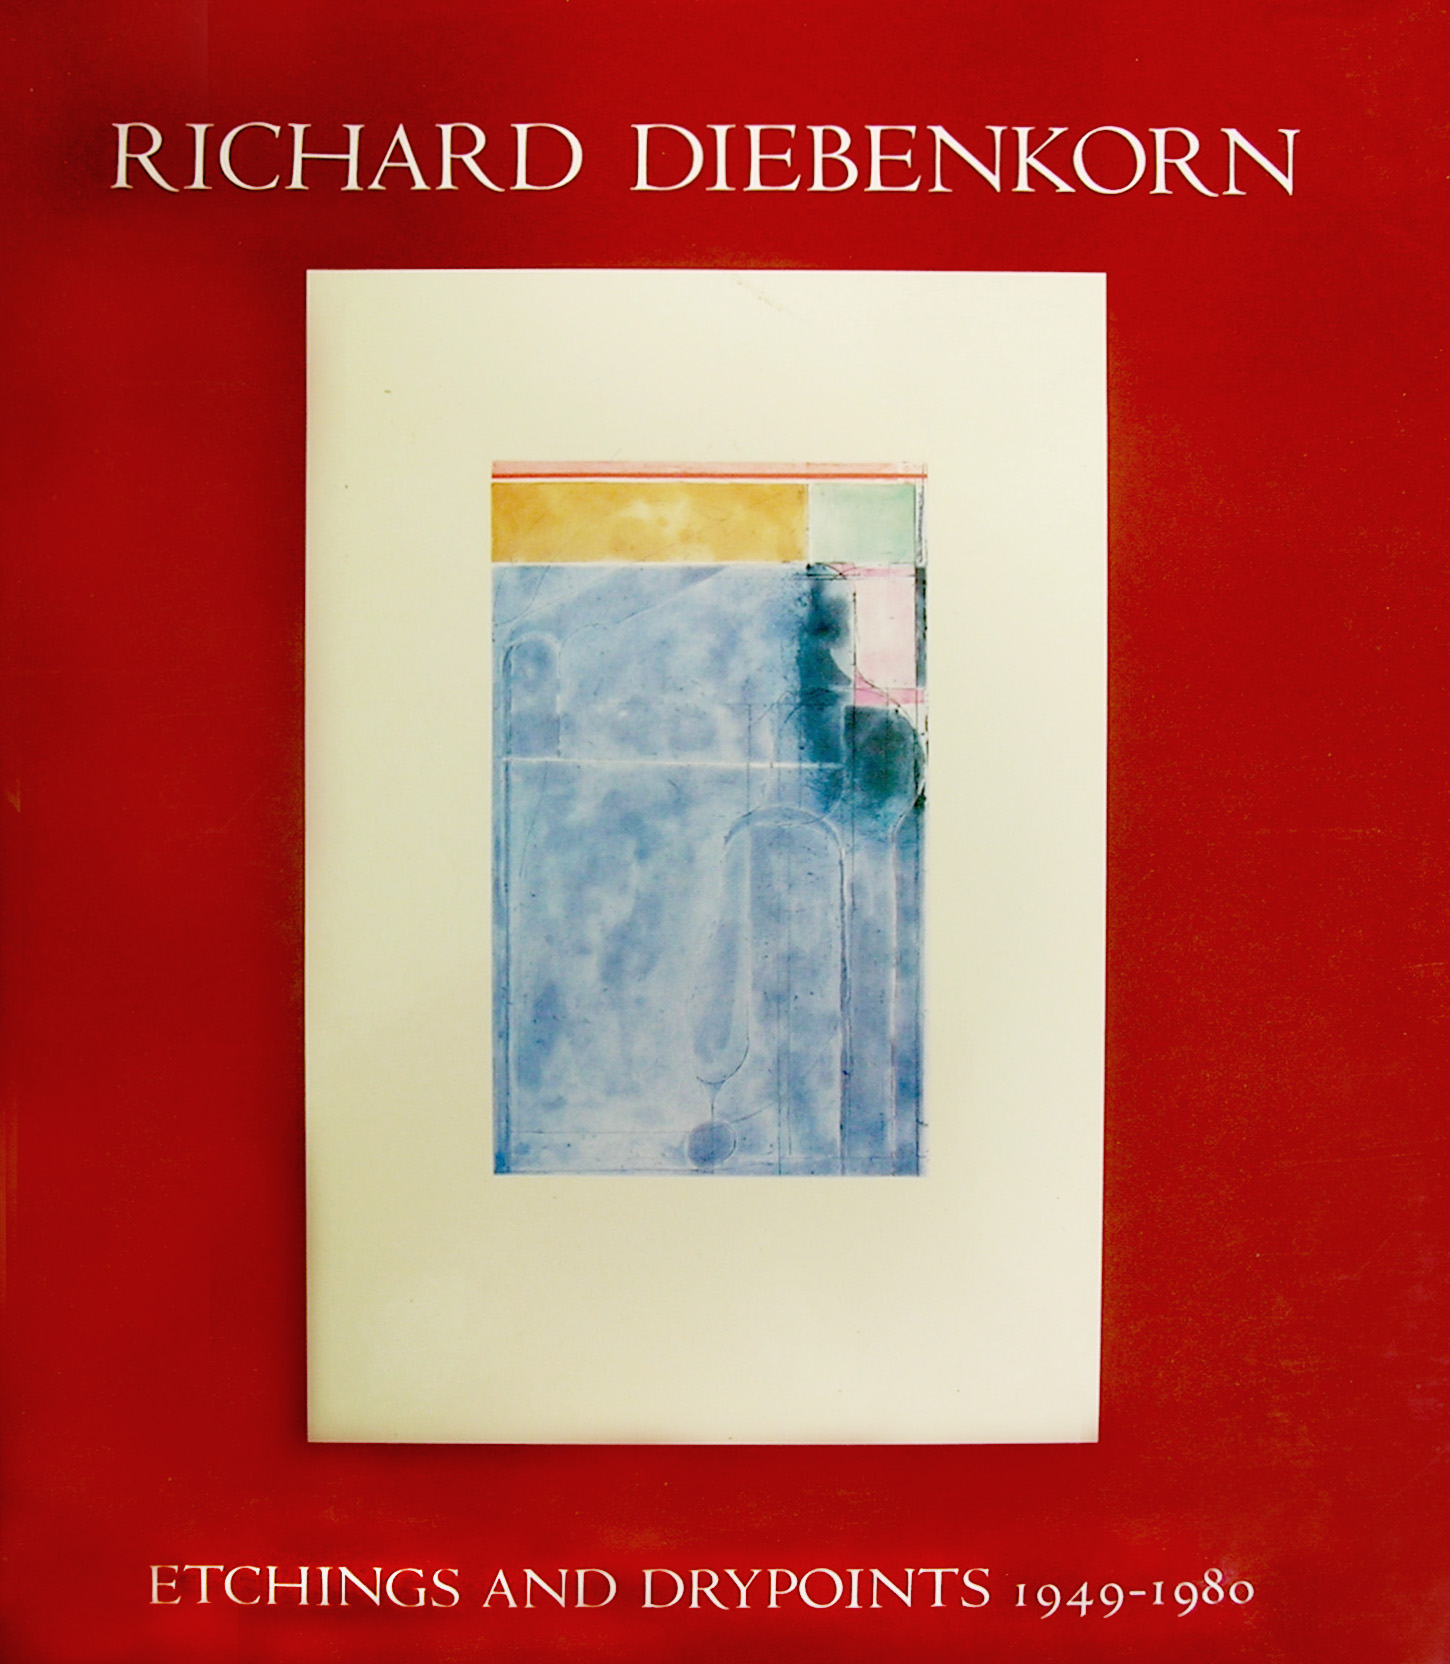 Richard Diebenkorn: Etchings and Drypoints 1949 – 1980